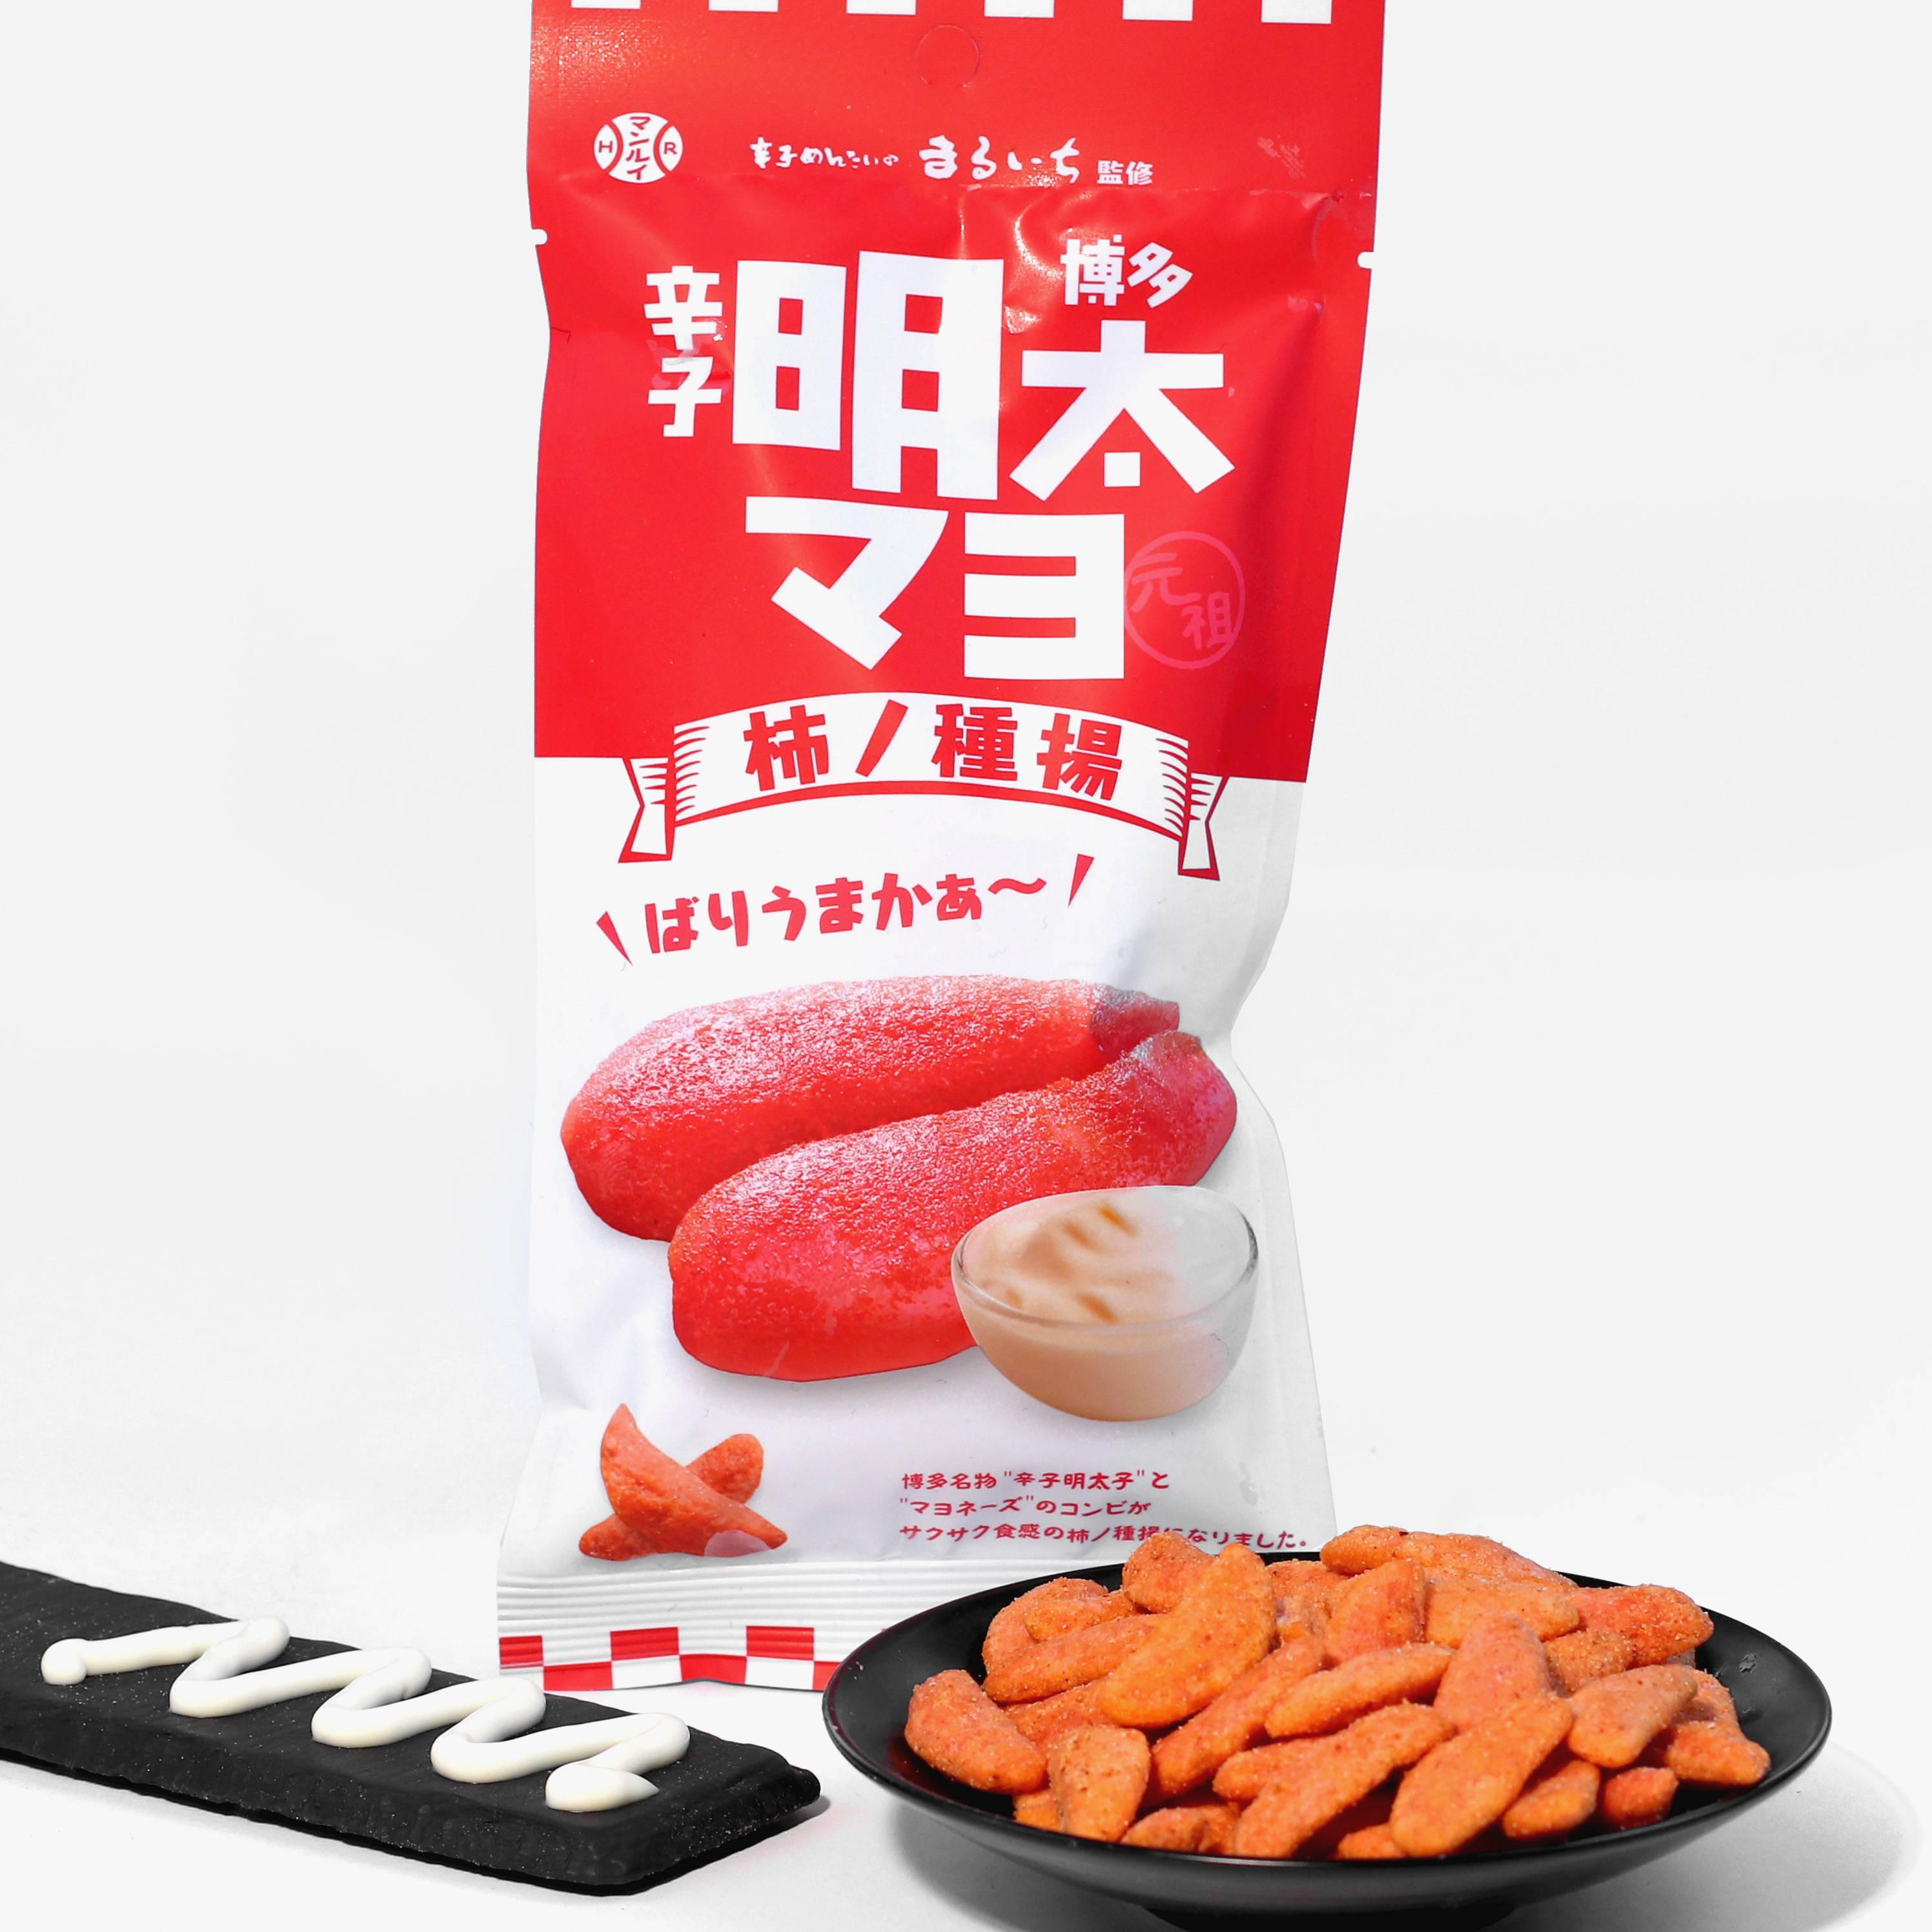 Fried Kakinotane: Hakata Karashi Mentai Mayo Flavor